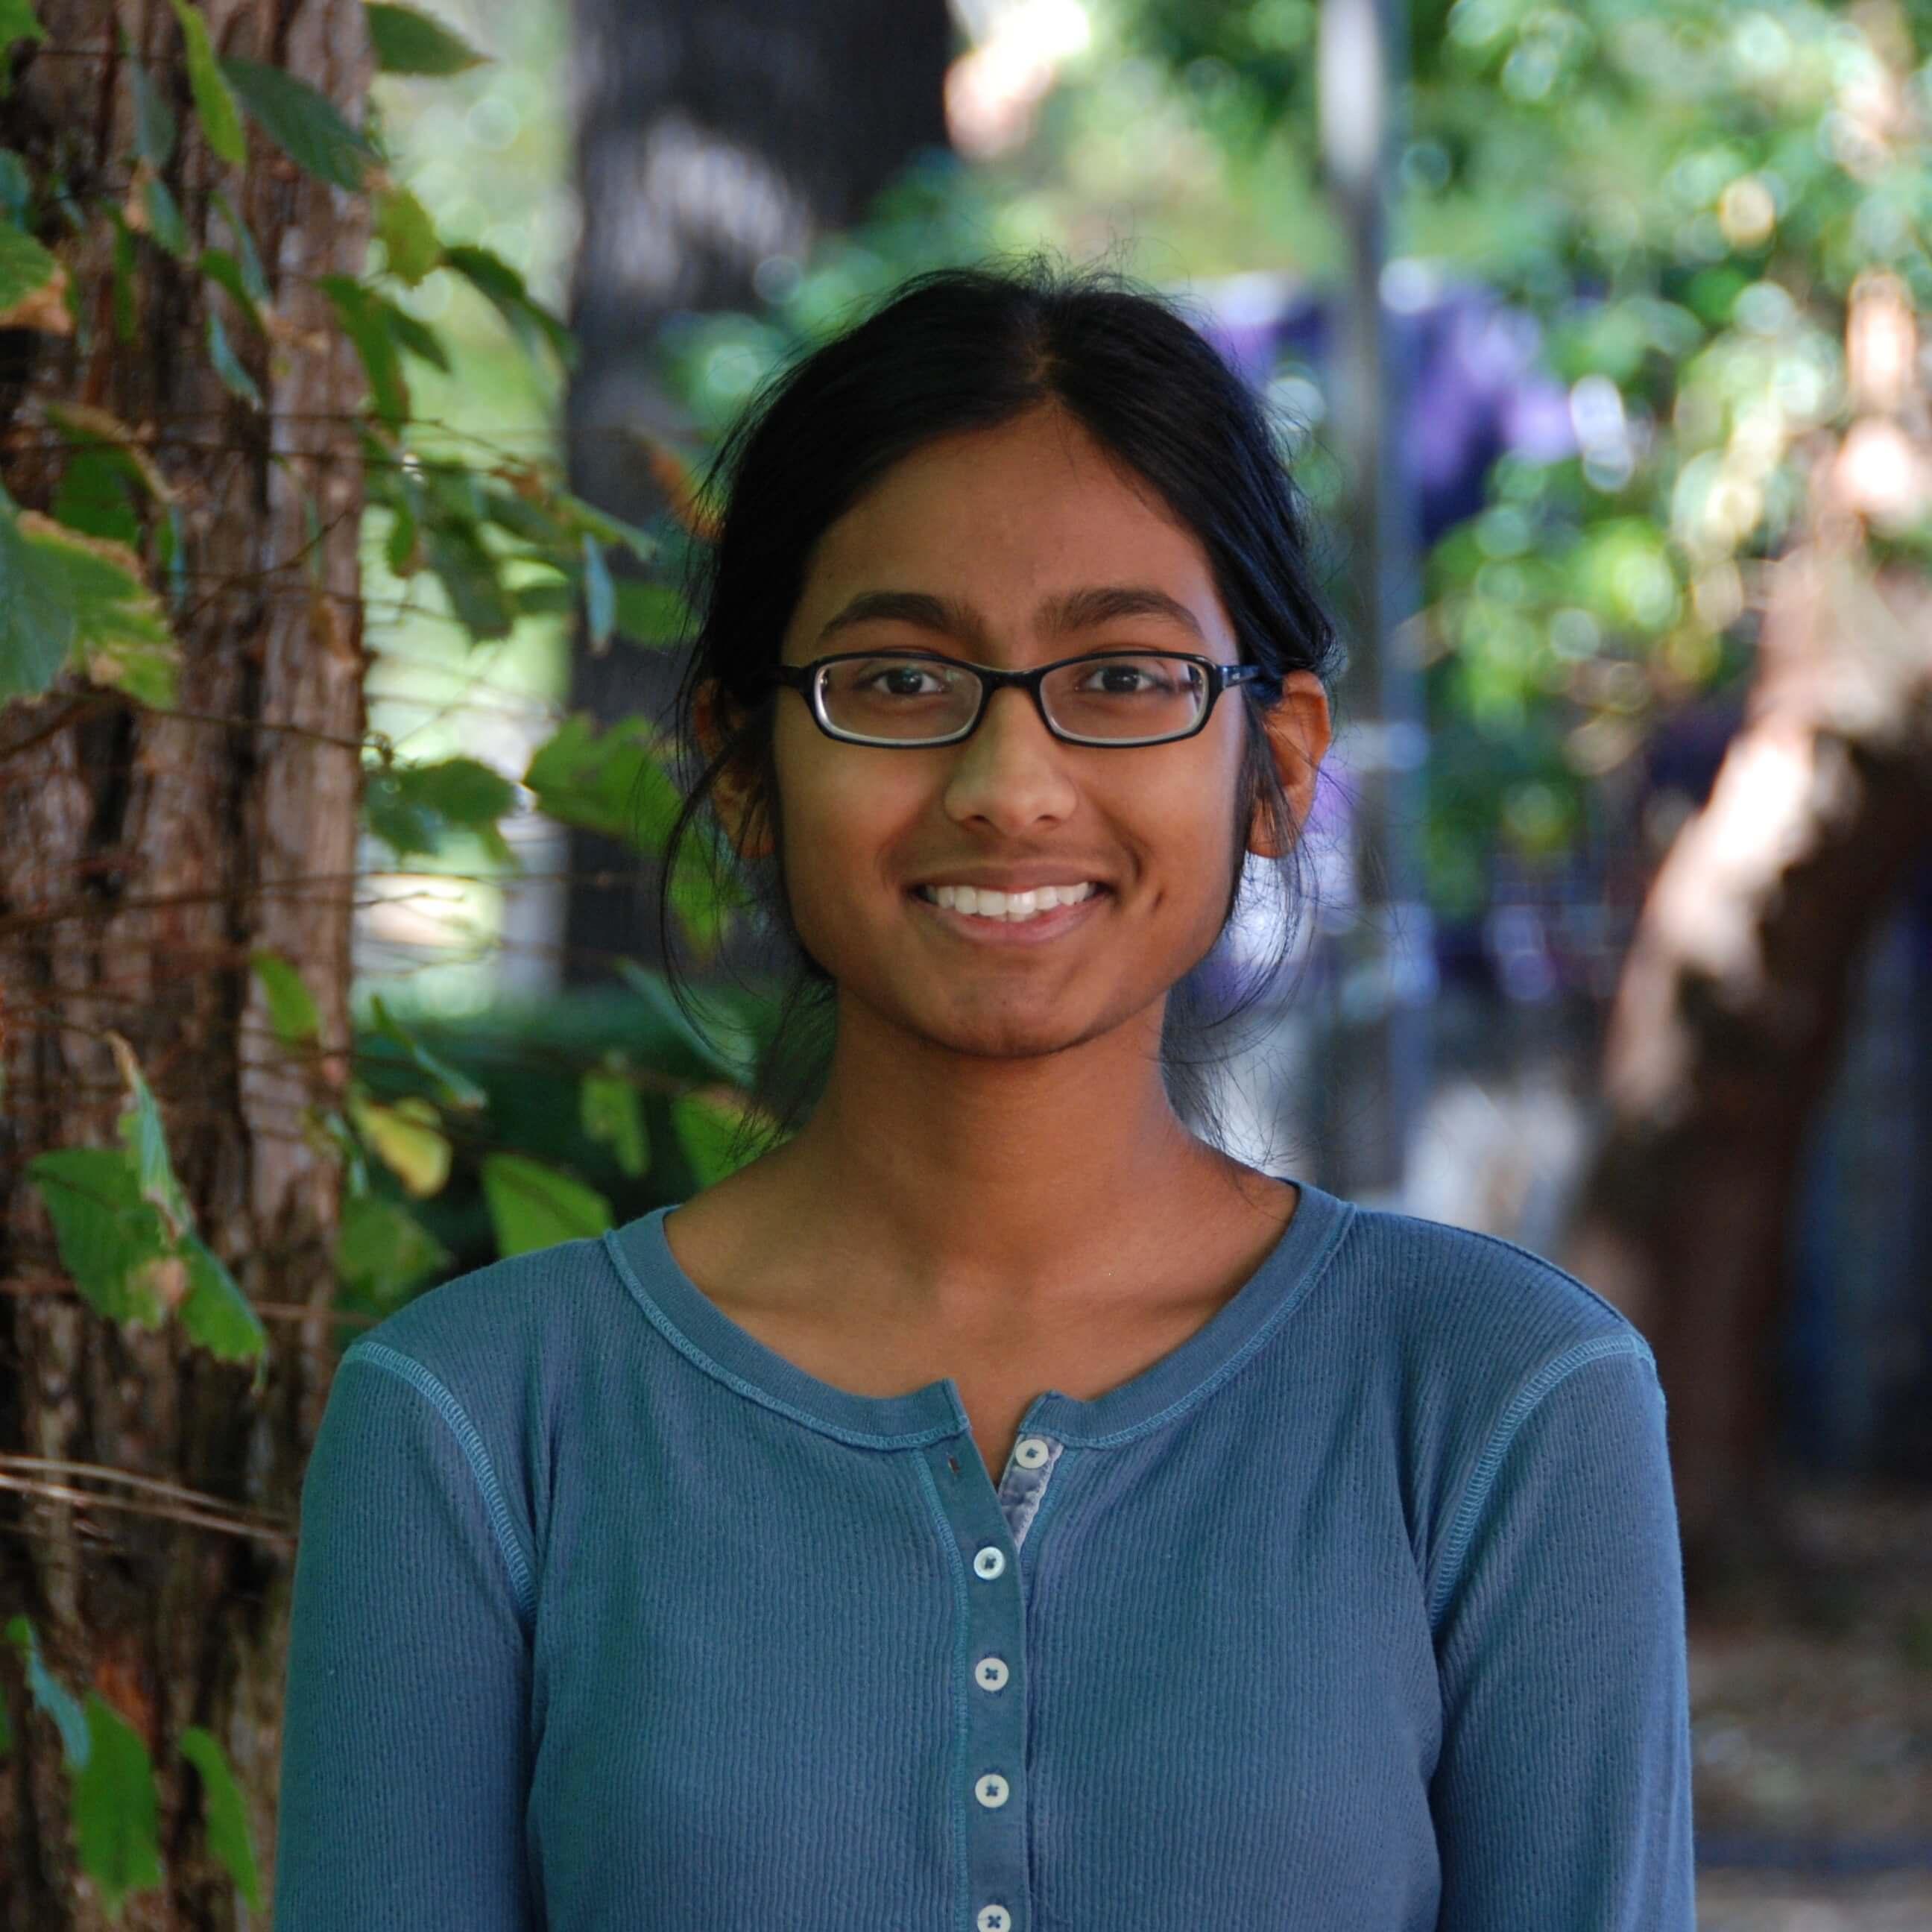 Fablina Sharara : Graduate Student